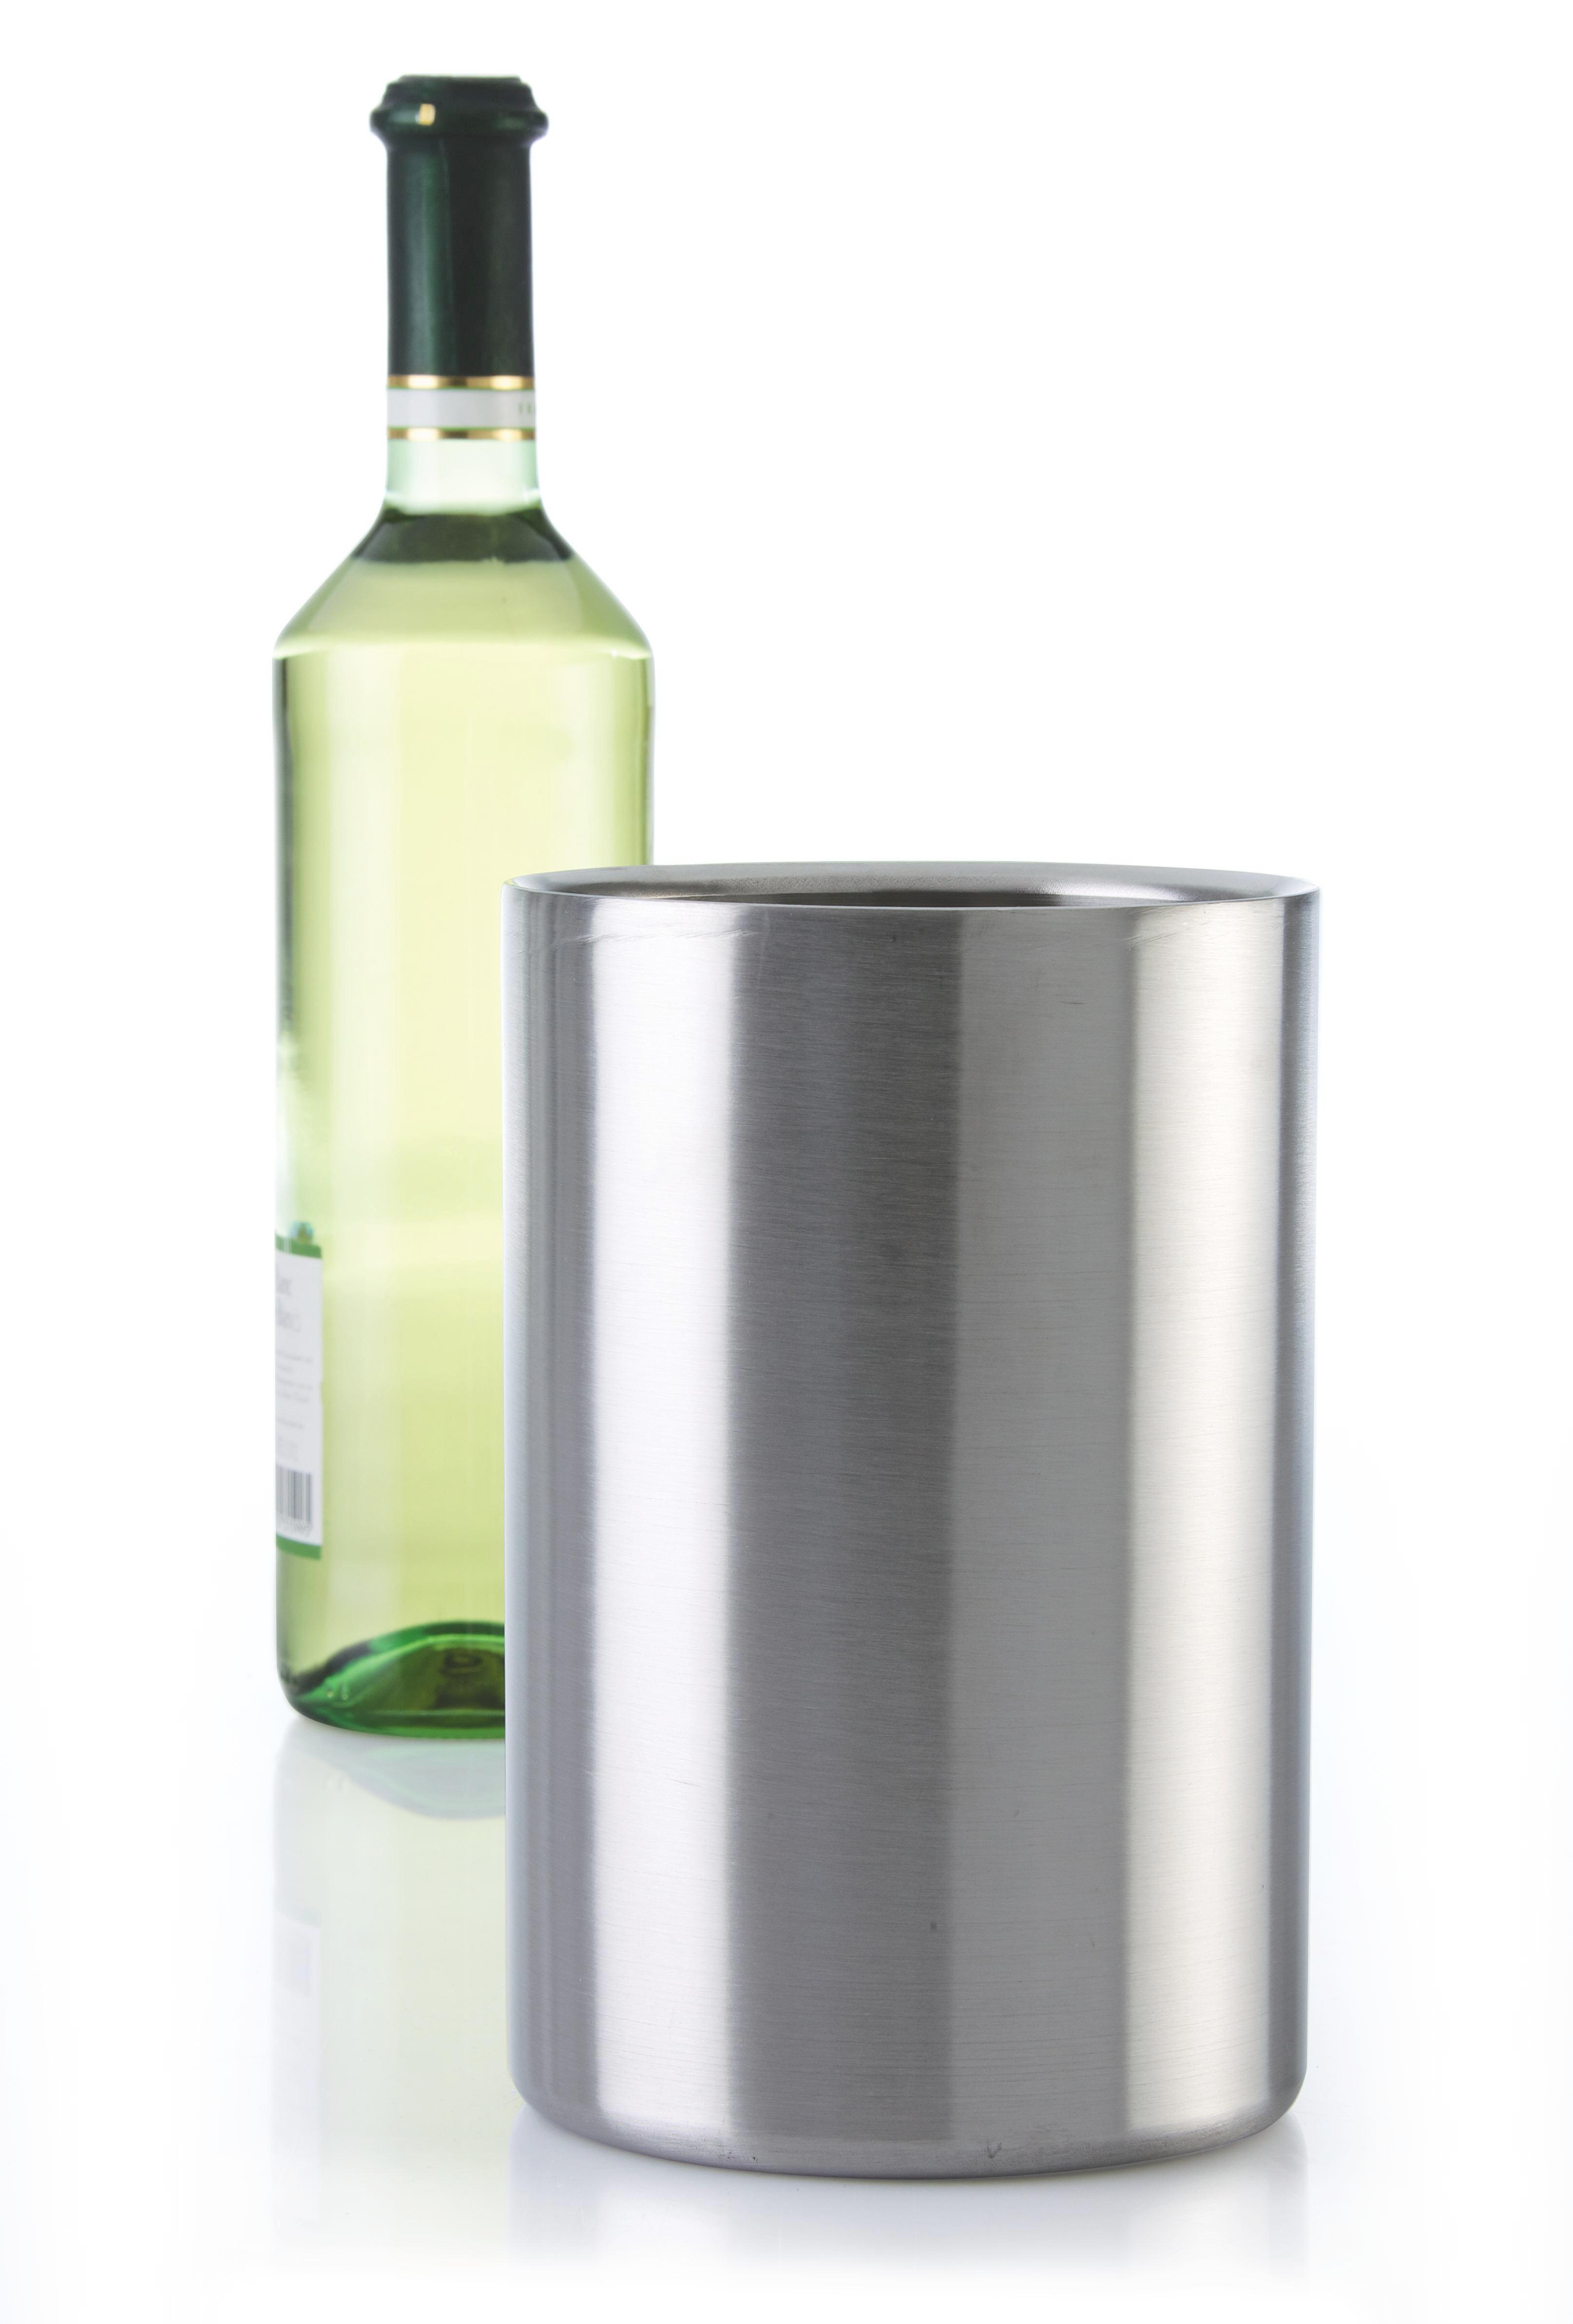 Flaschenkühler Timo - Edelstahlfarben, MODERN, Metall (11,5/20cm) - MÖMAX modern living